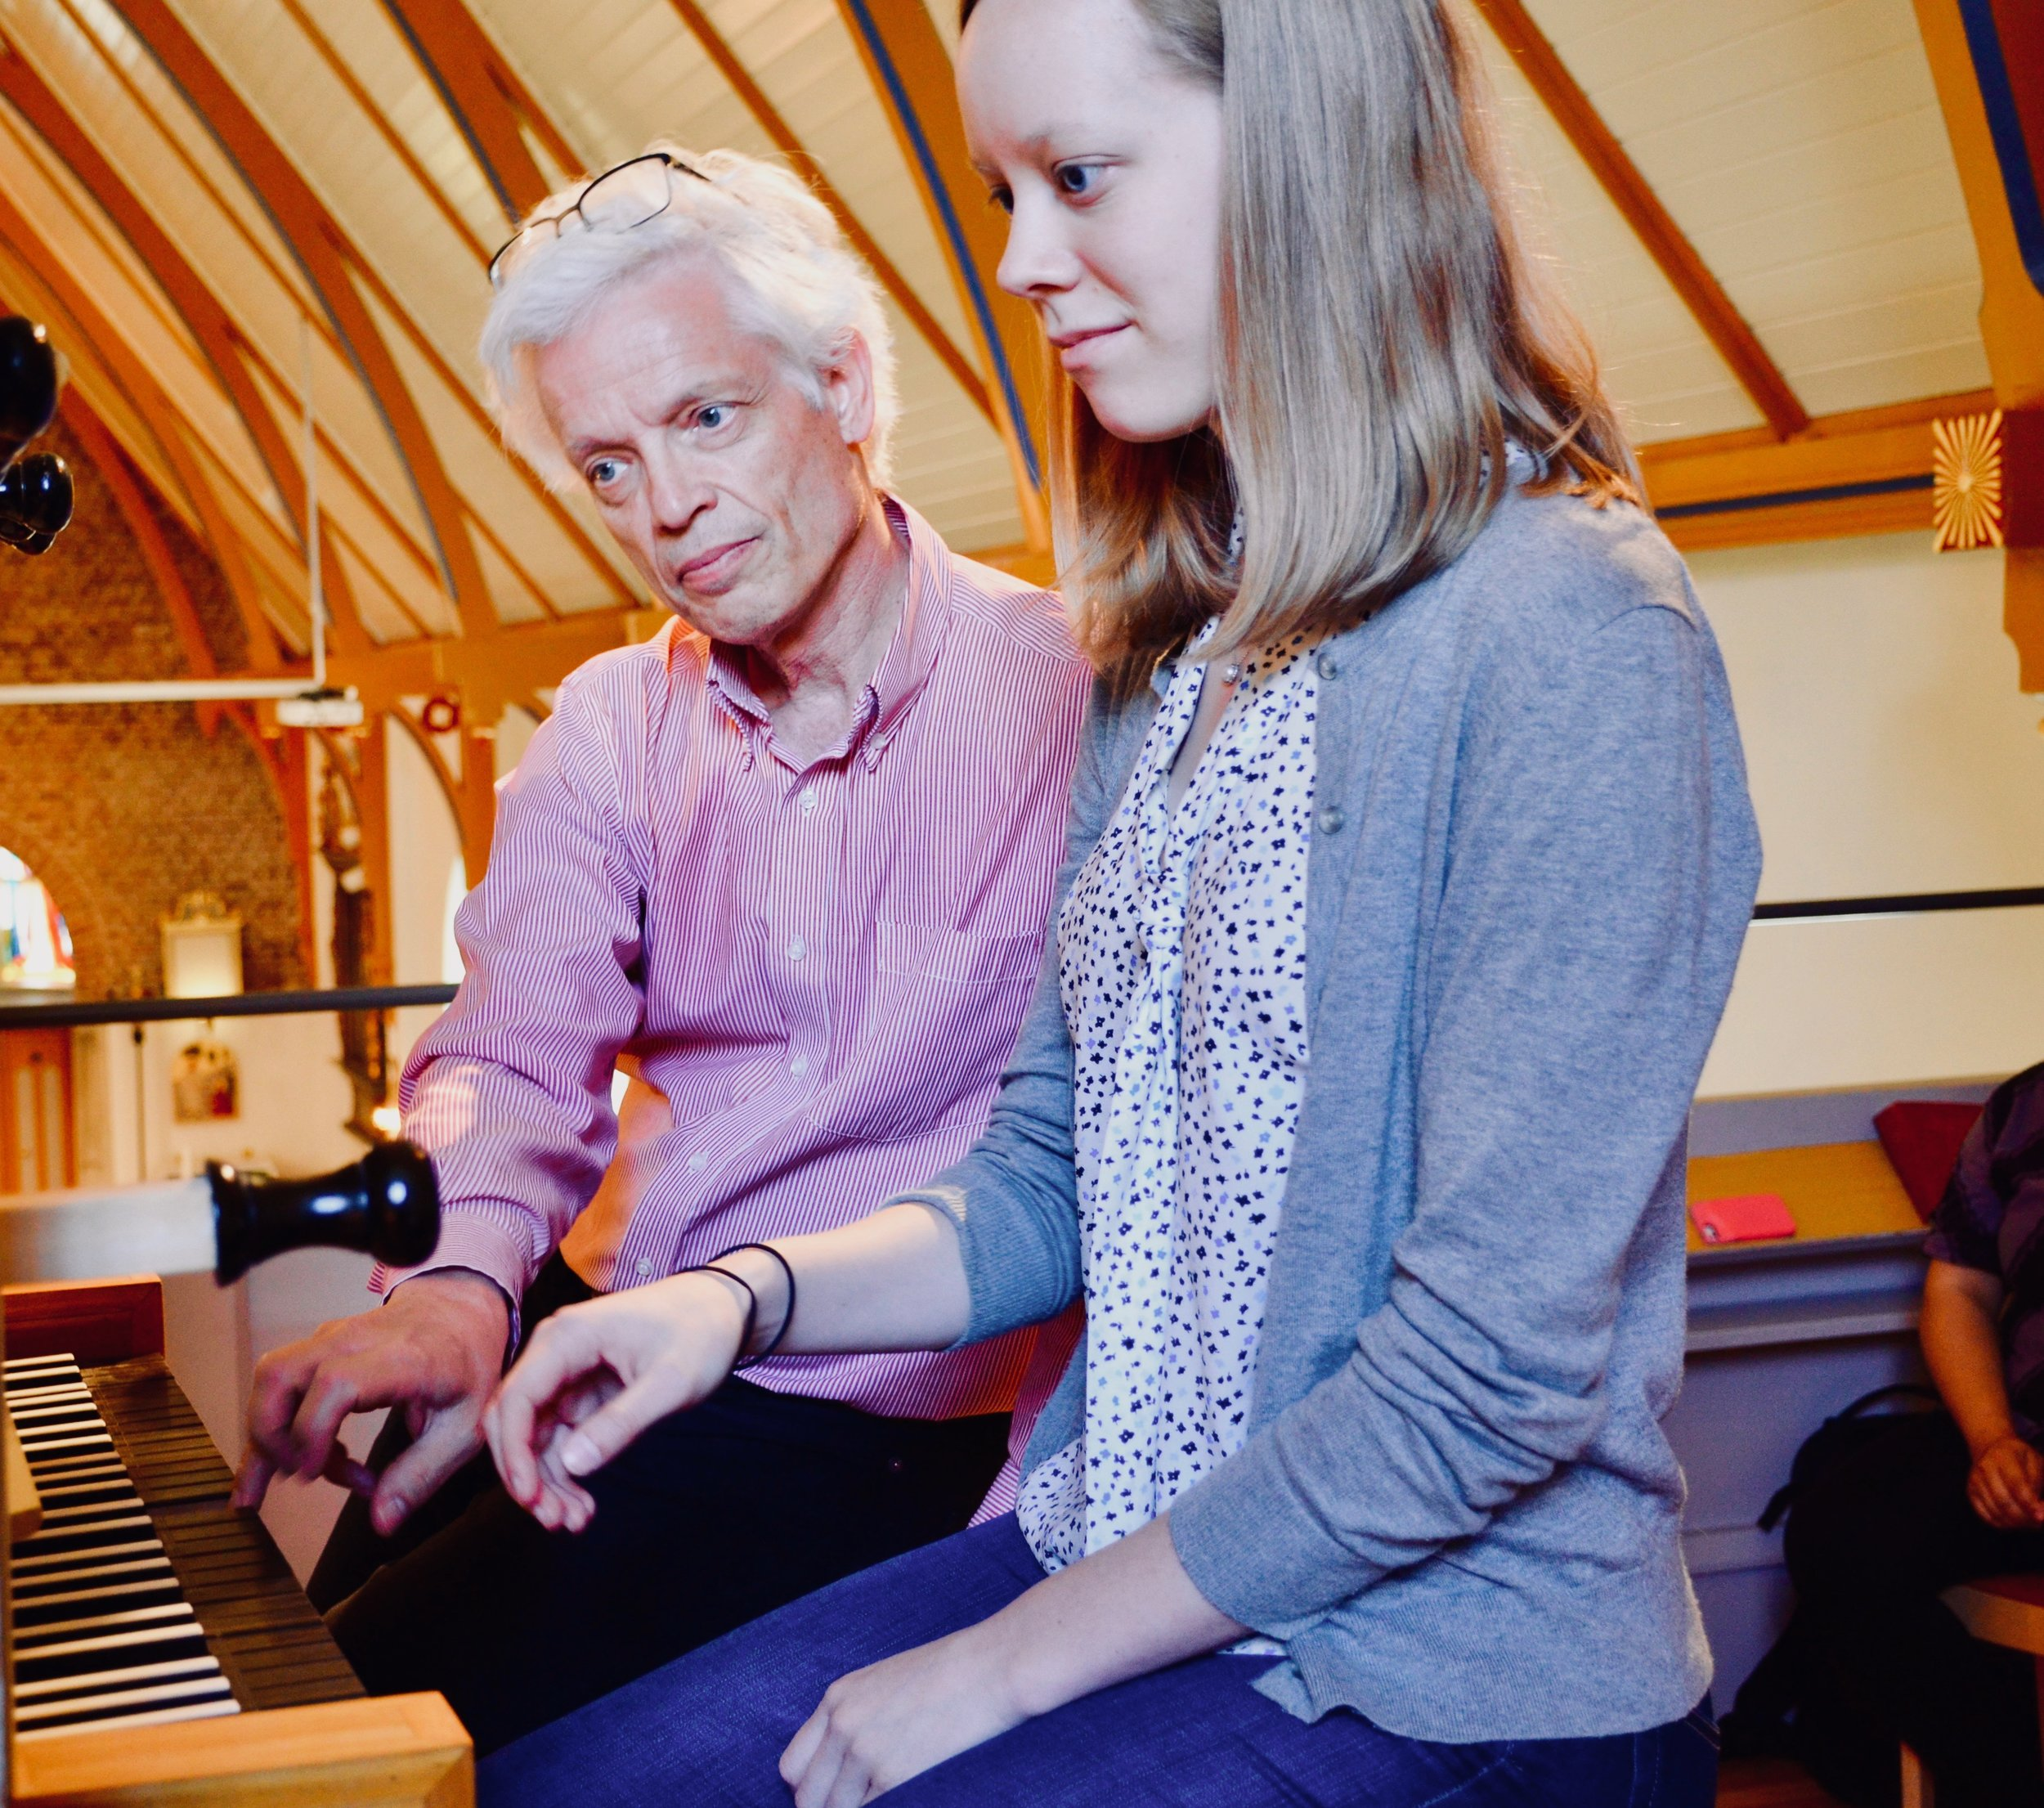 Hans Davidsson coaches Laura Gullett on the 1783 Schiörlin organ in Jonsered, Sweden.